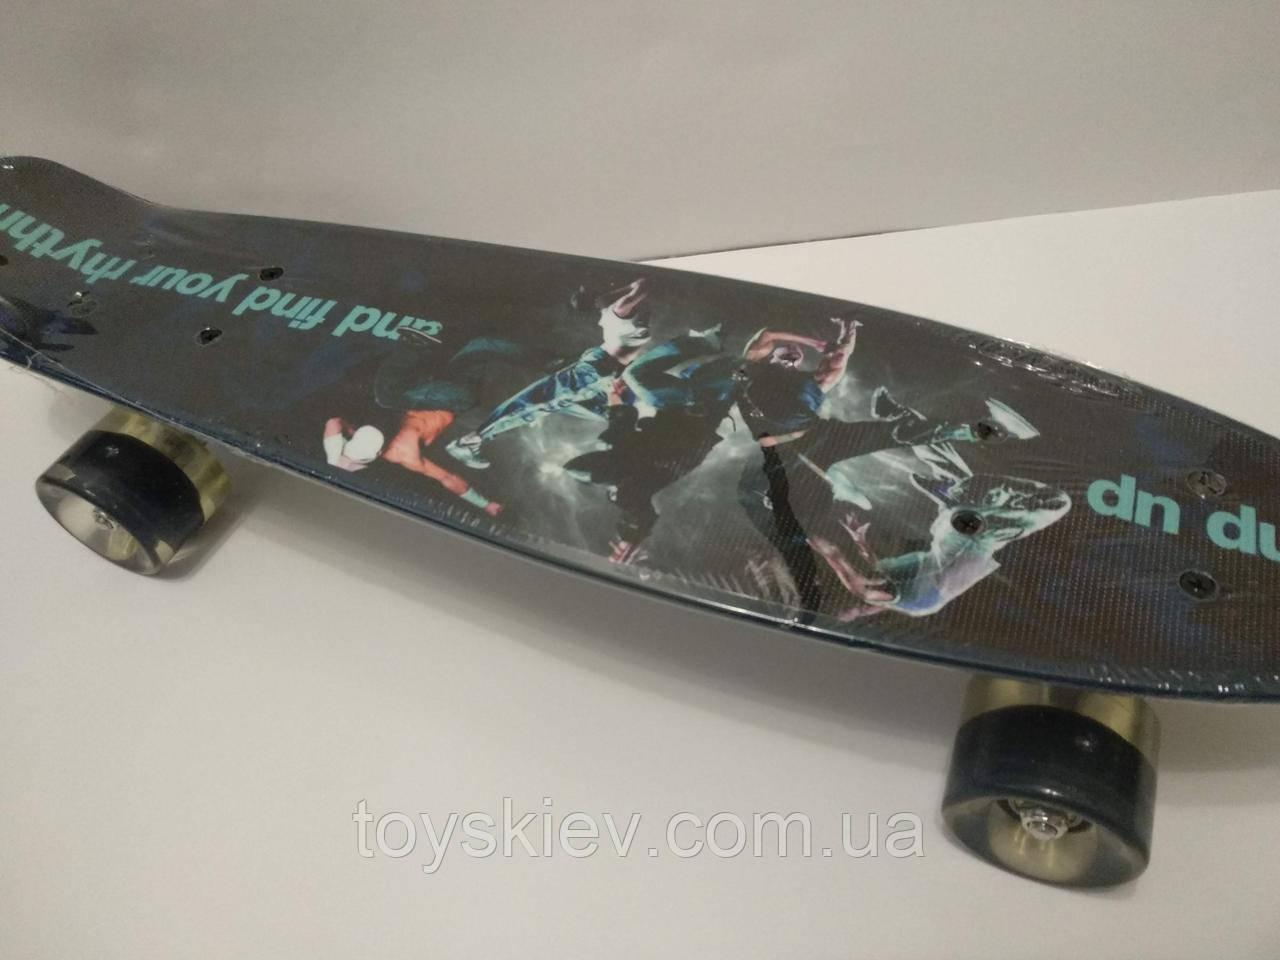 Скейт Пенни борд (Penny board) 820-23 с рисунком, светящийся